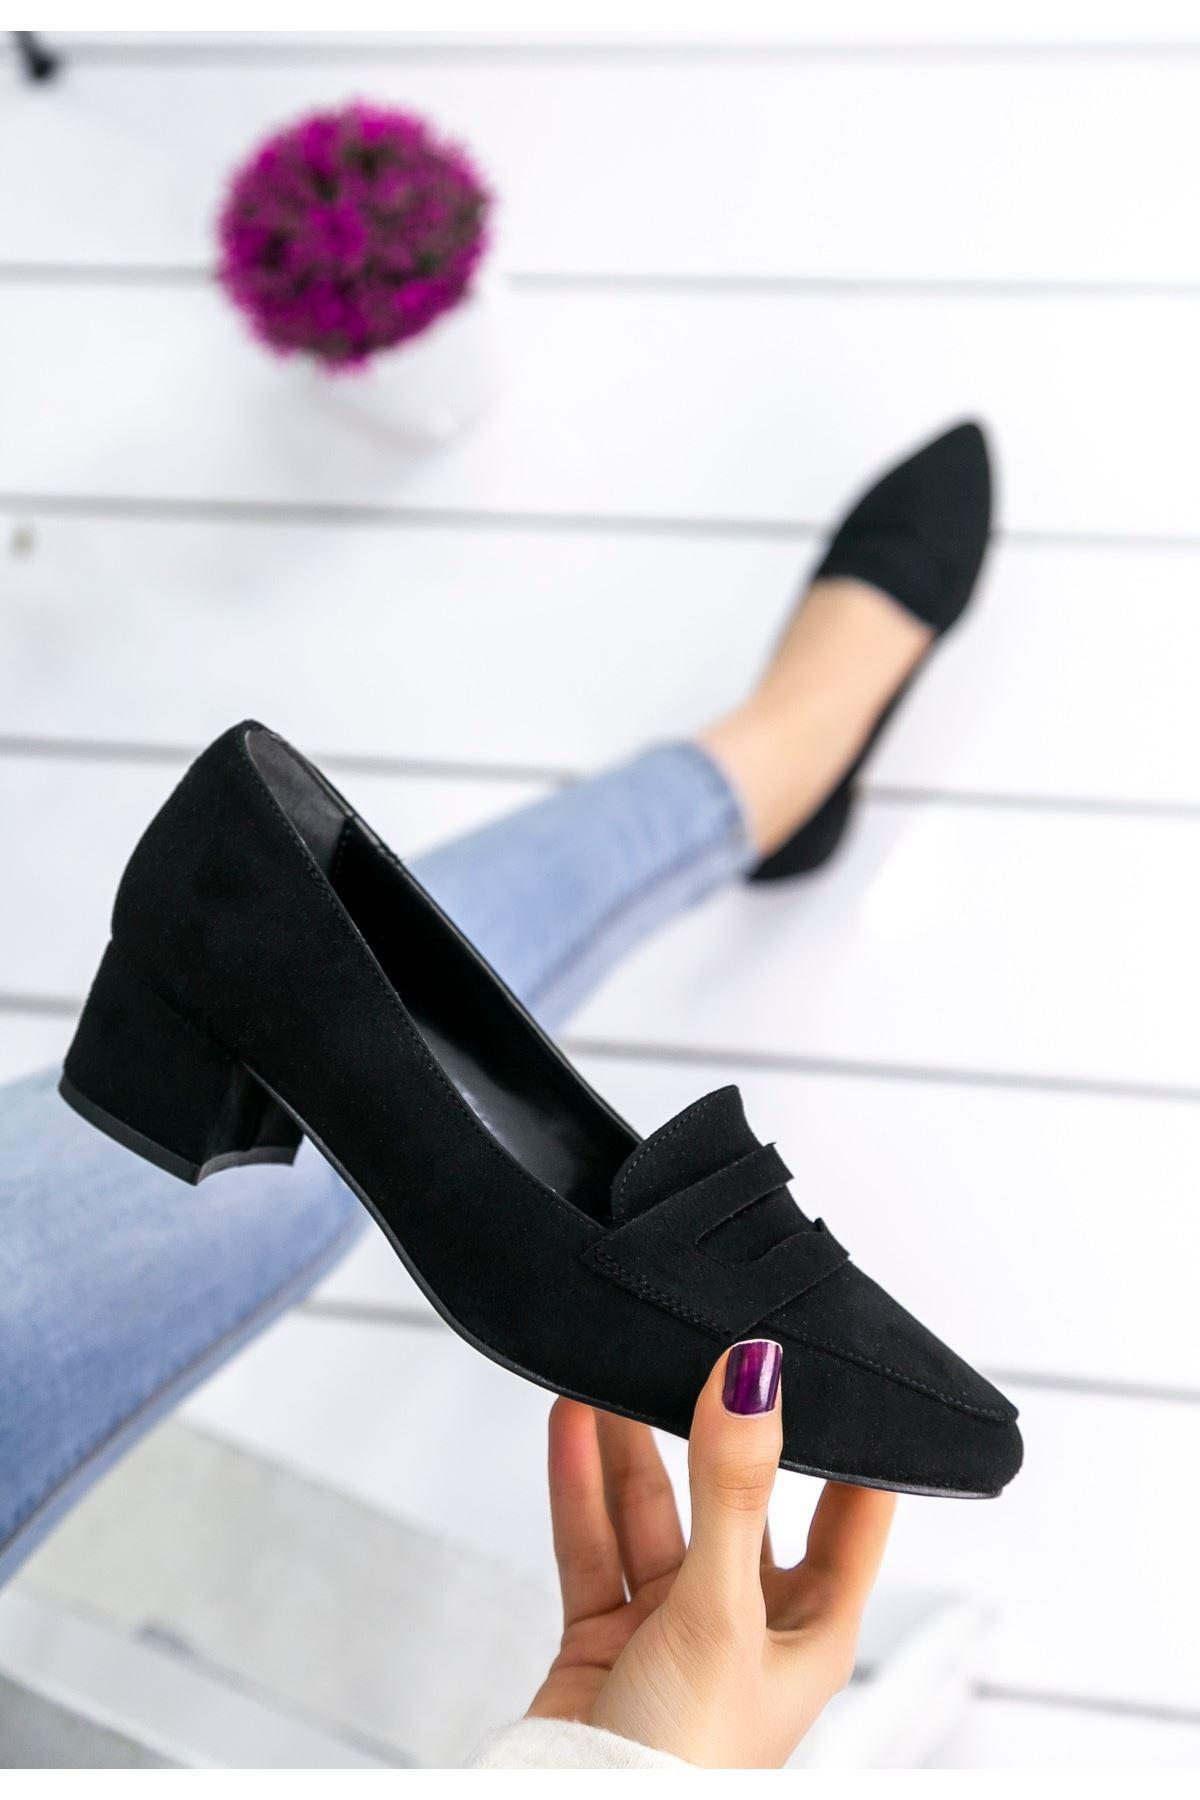 Reyna Siyah Süet Topuklu Ayakkabı